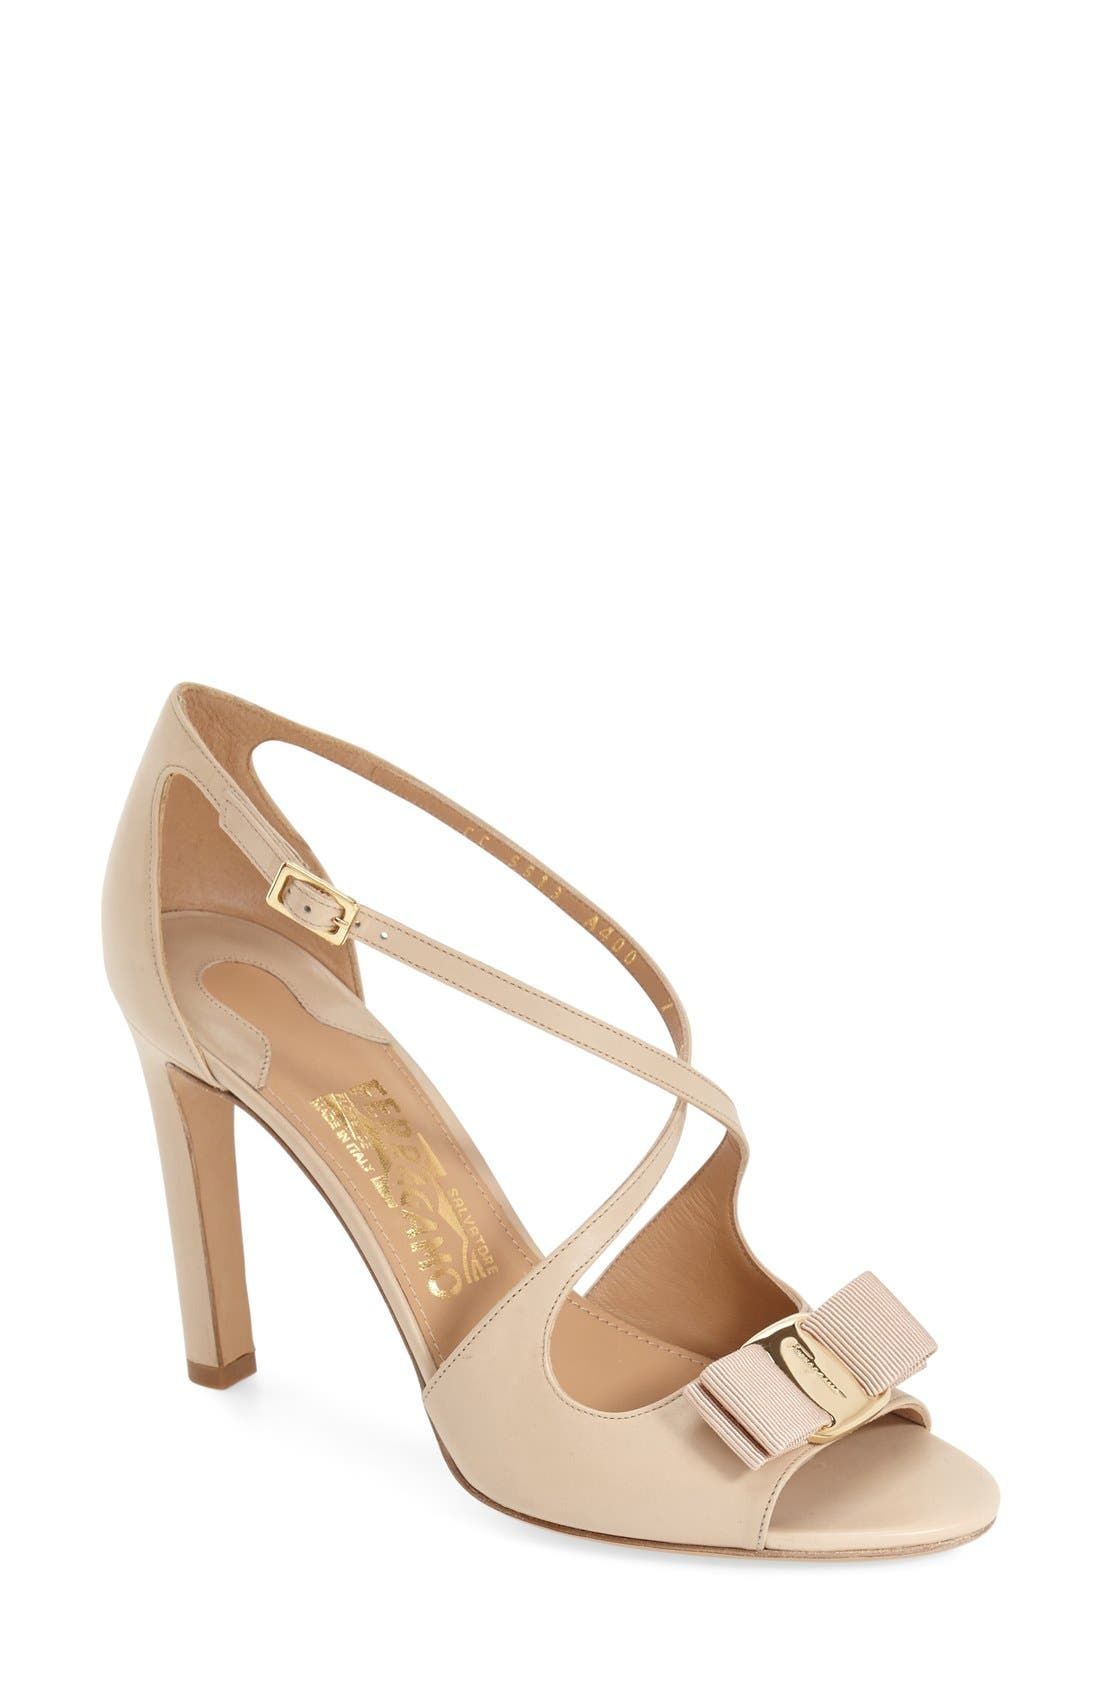 Alternate Image 1 Selected - Salvatore Ferragamo 'Gabrielle' Strappy Bow Trim Sandal (Women)